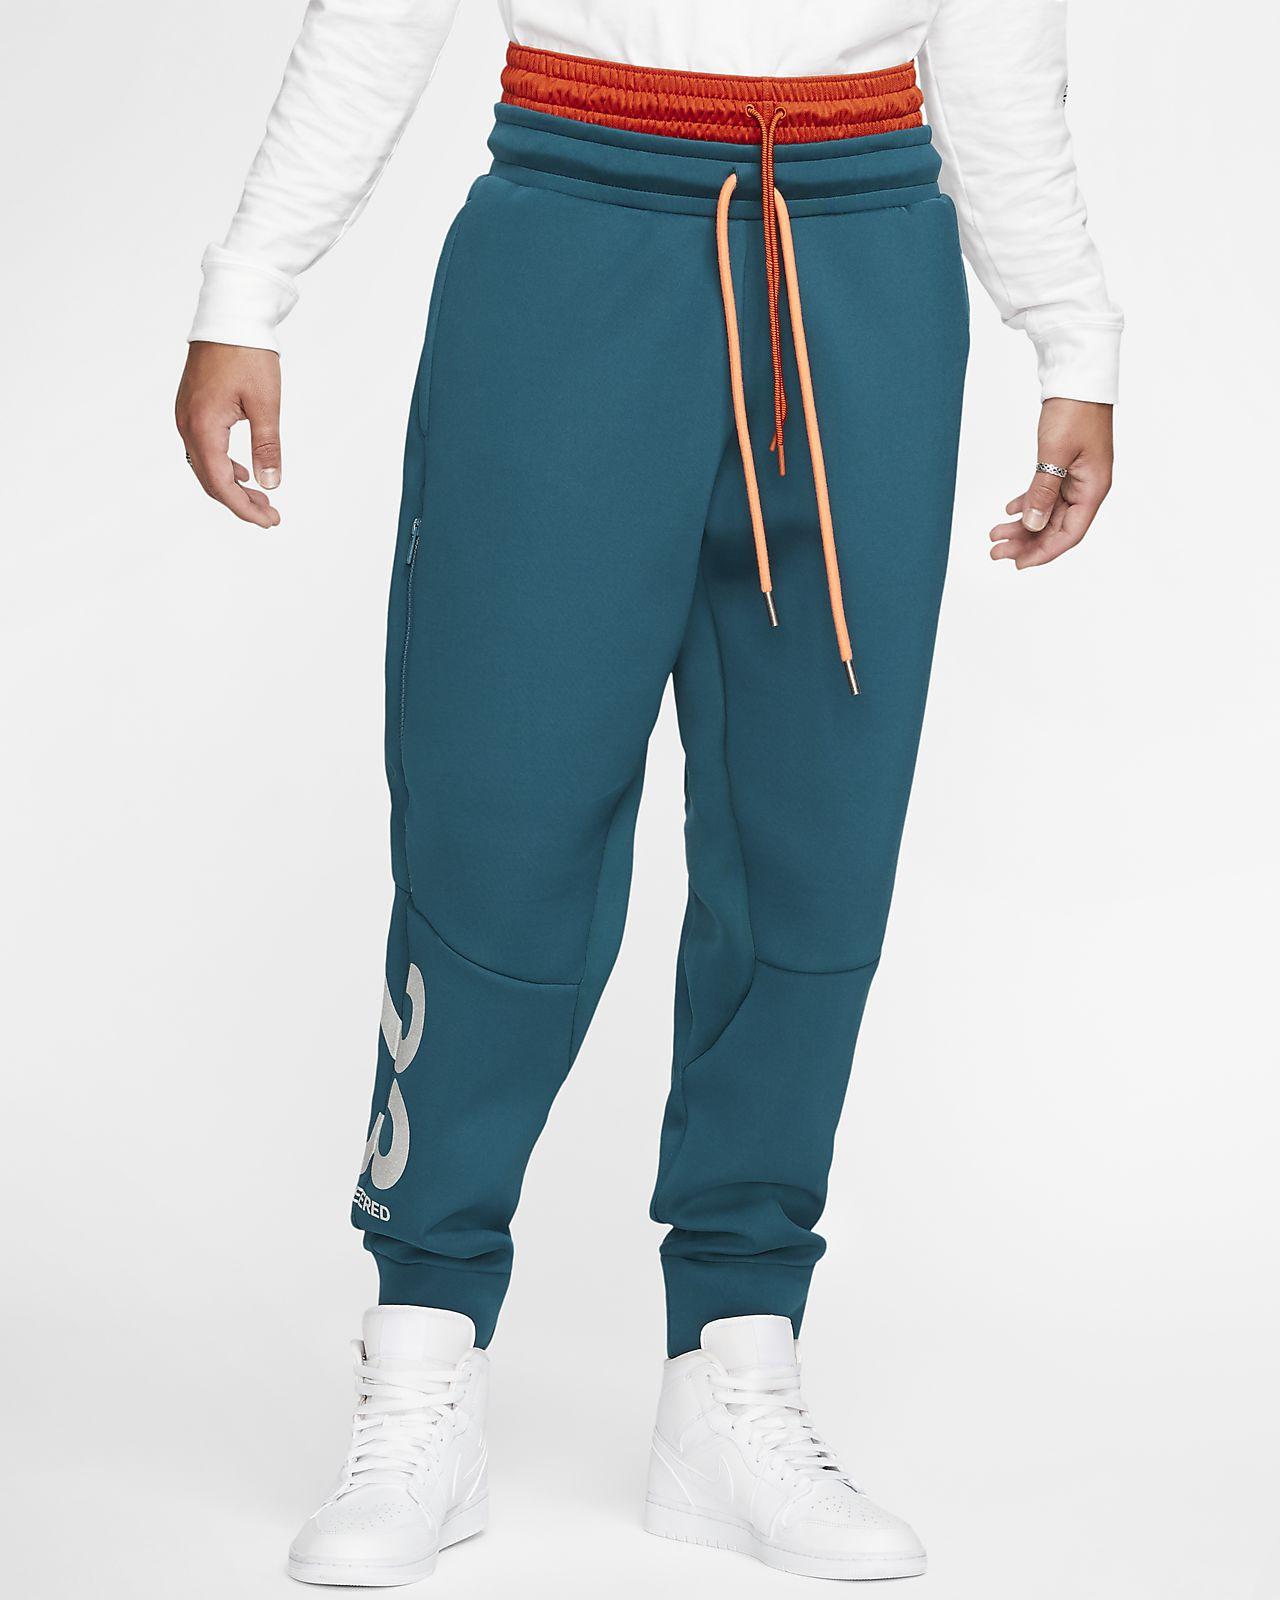 Jordan 23 Engineered 男子针织长裤